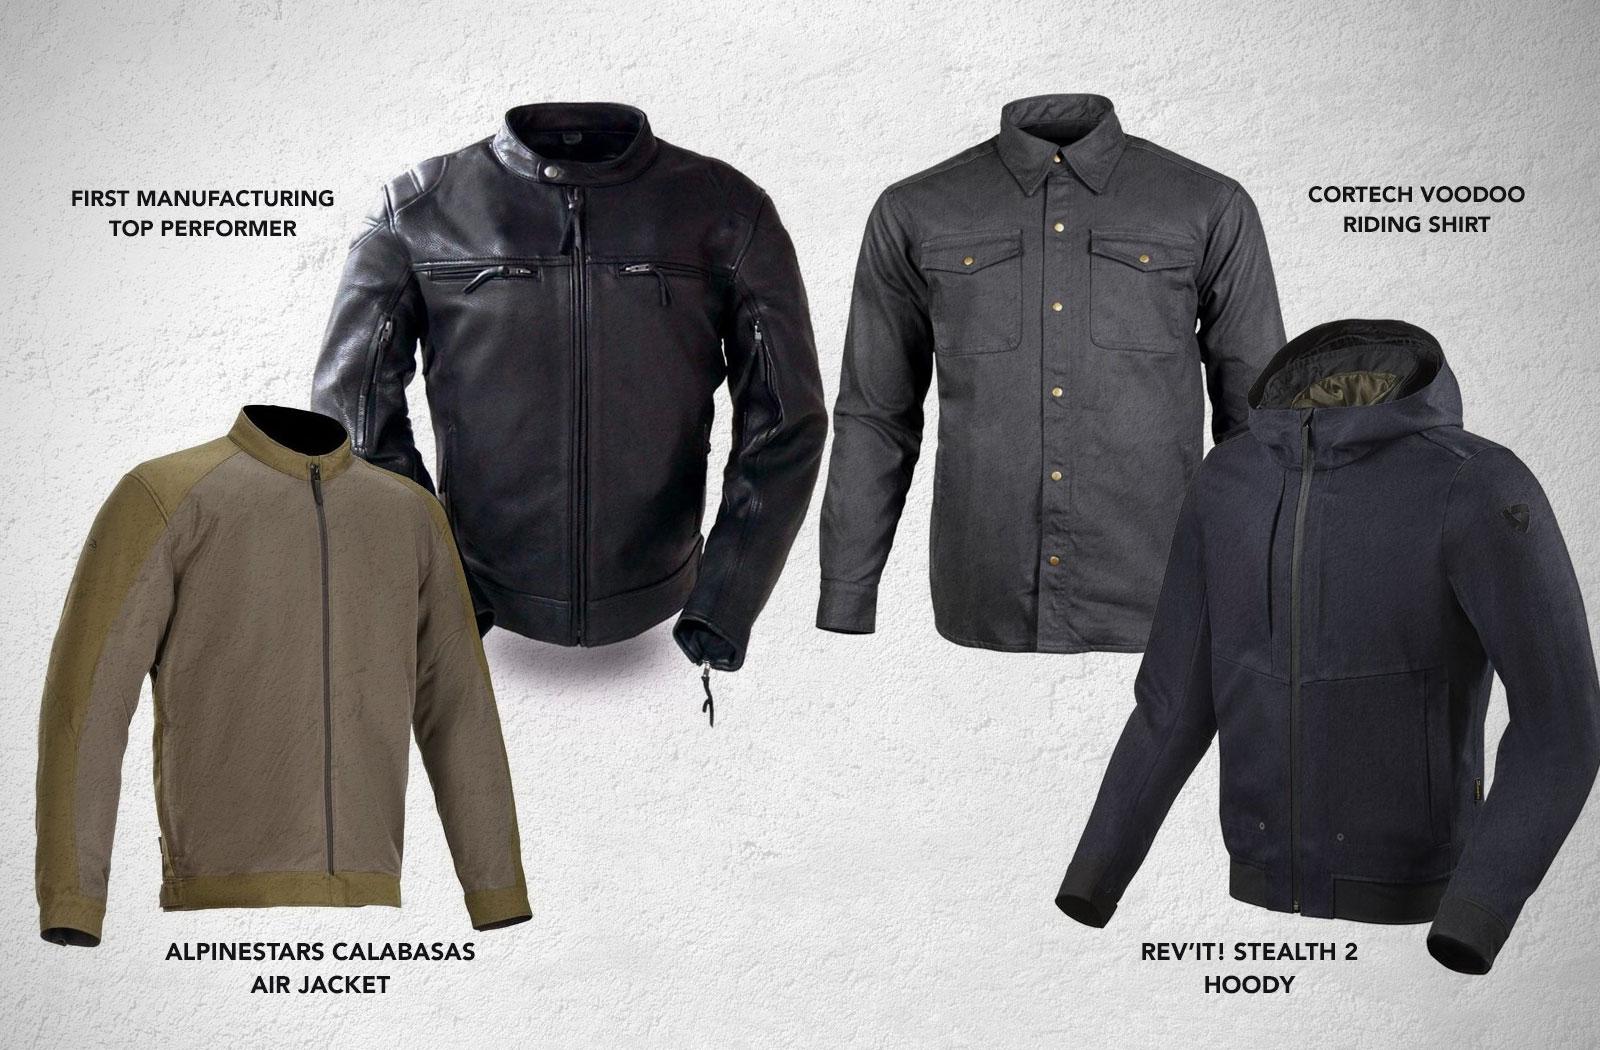 Cafe racer jackets